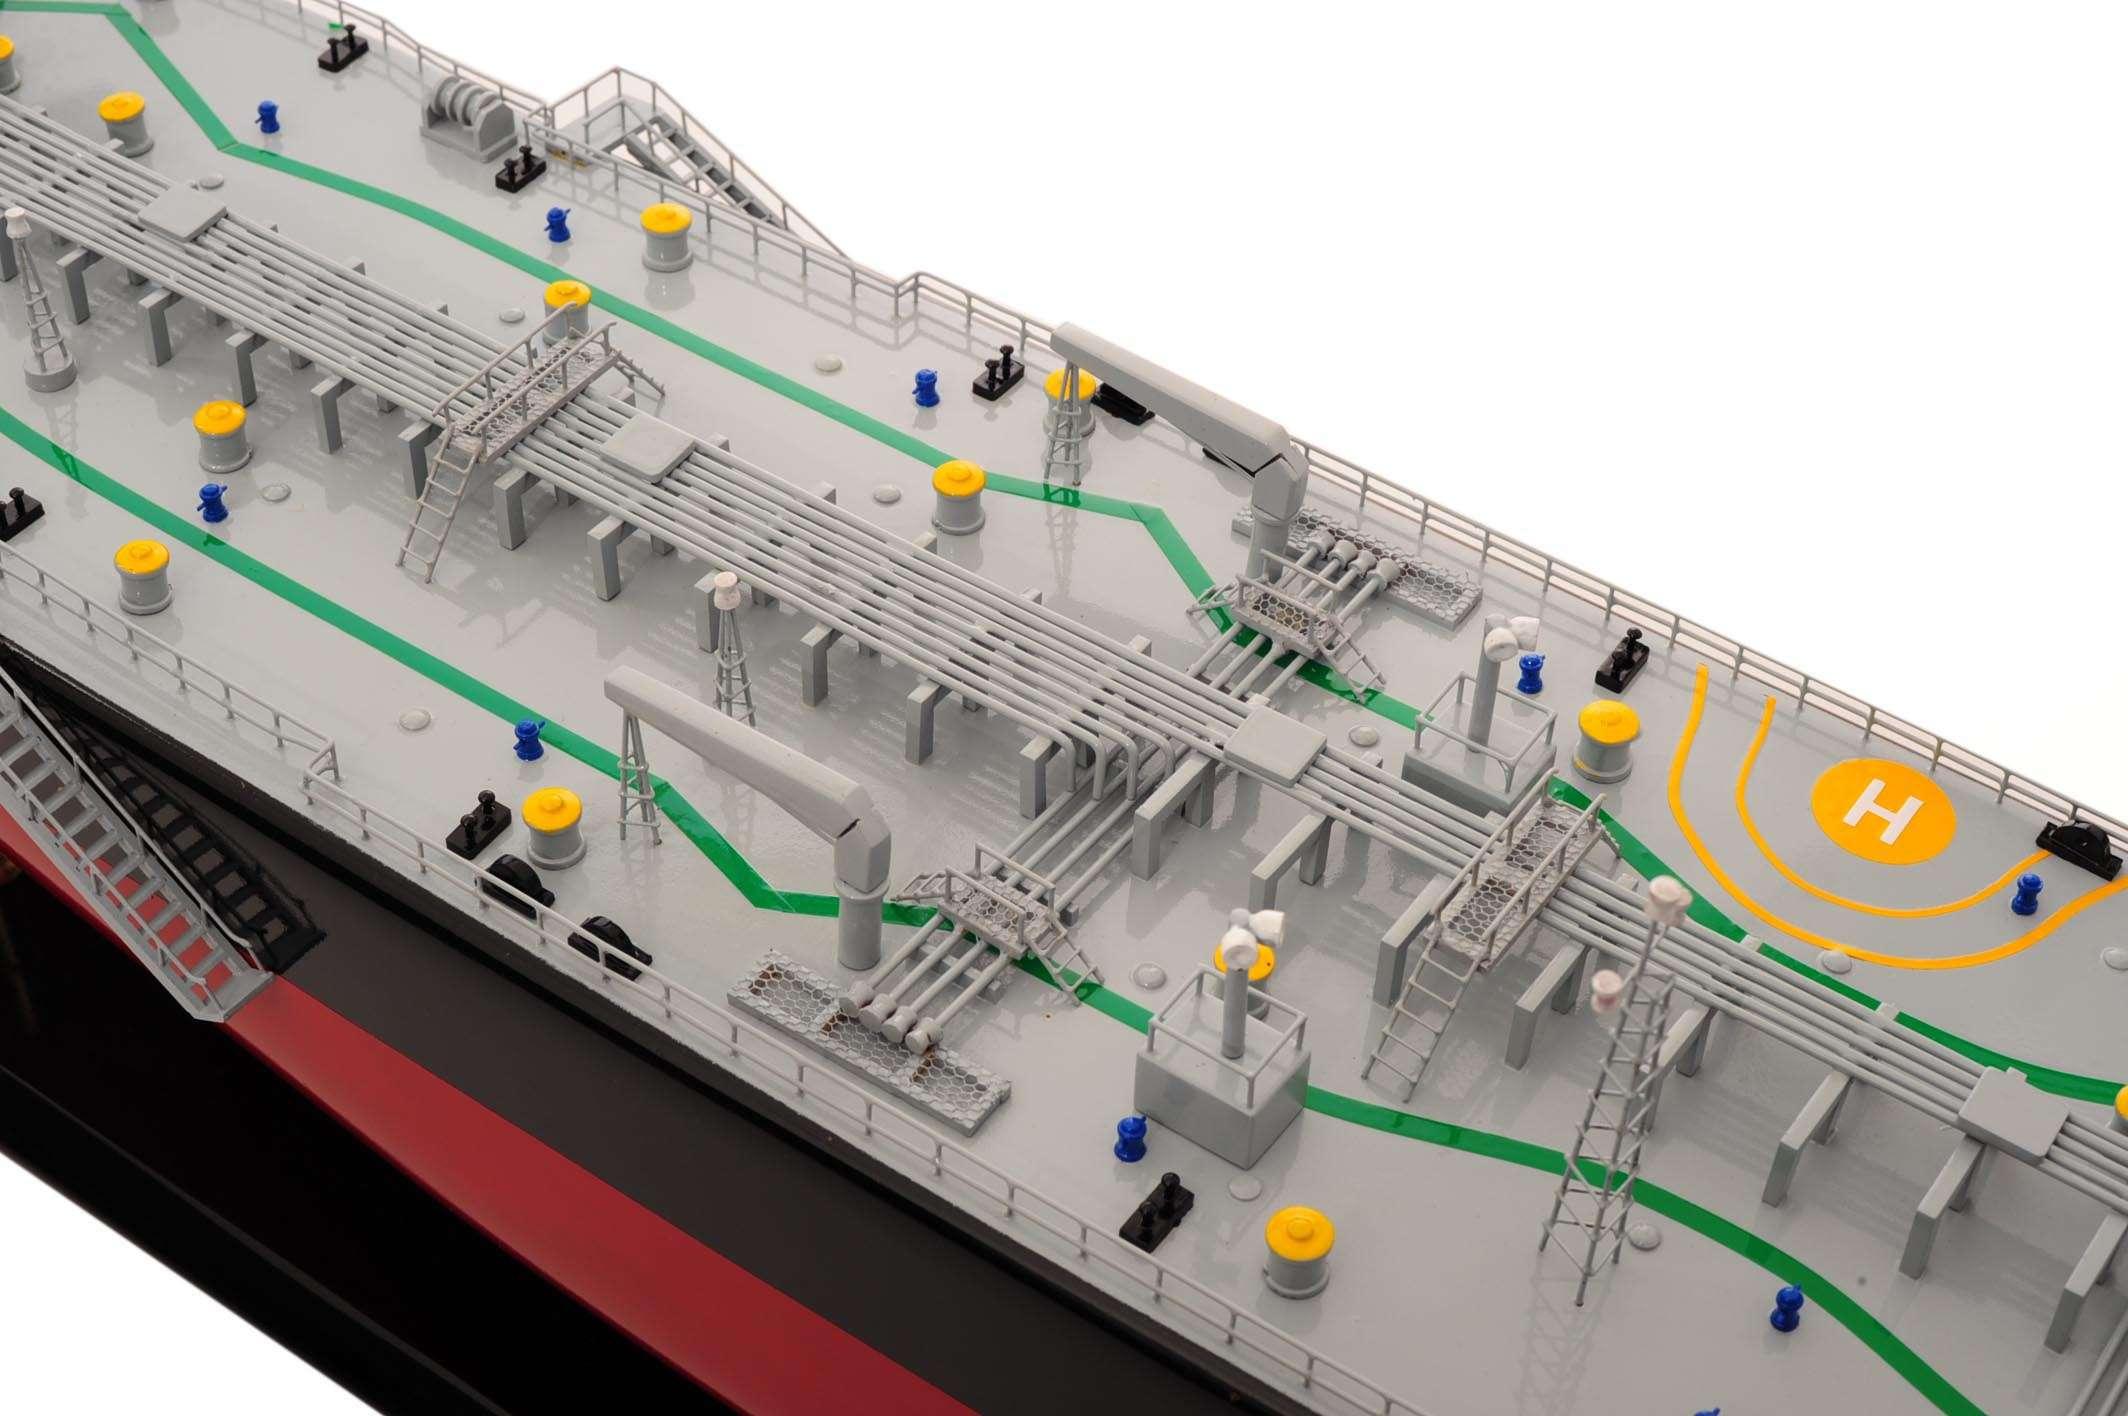 1475-4415-Very-Large-Crude-Oil-VLCC-Tanker